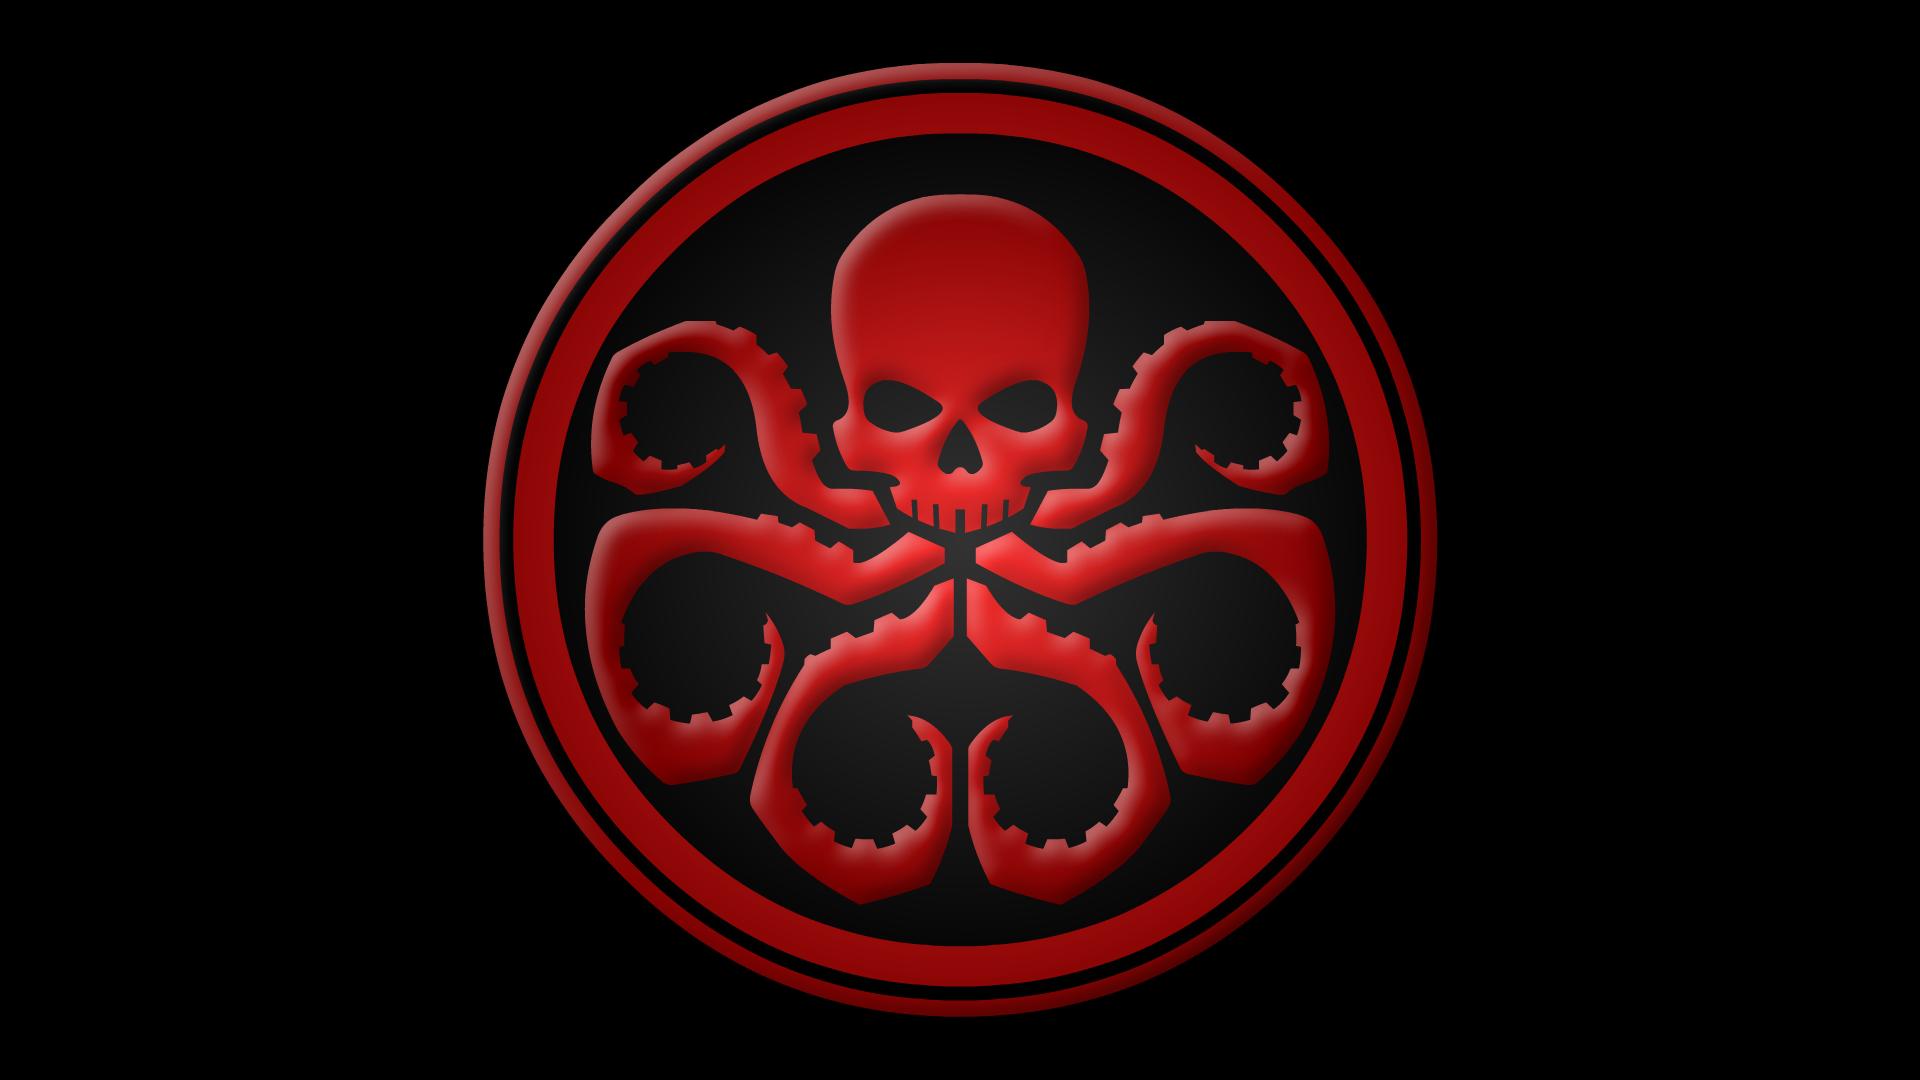 hydra symbol by yurtigo on deviantart